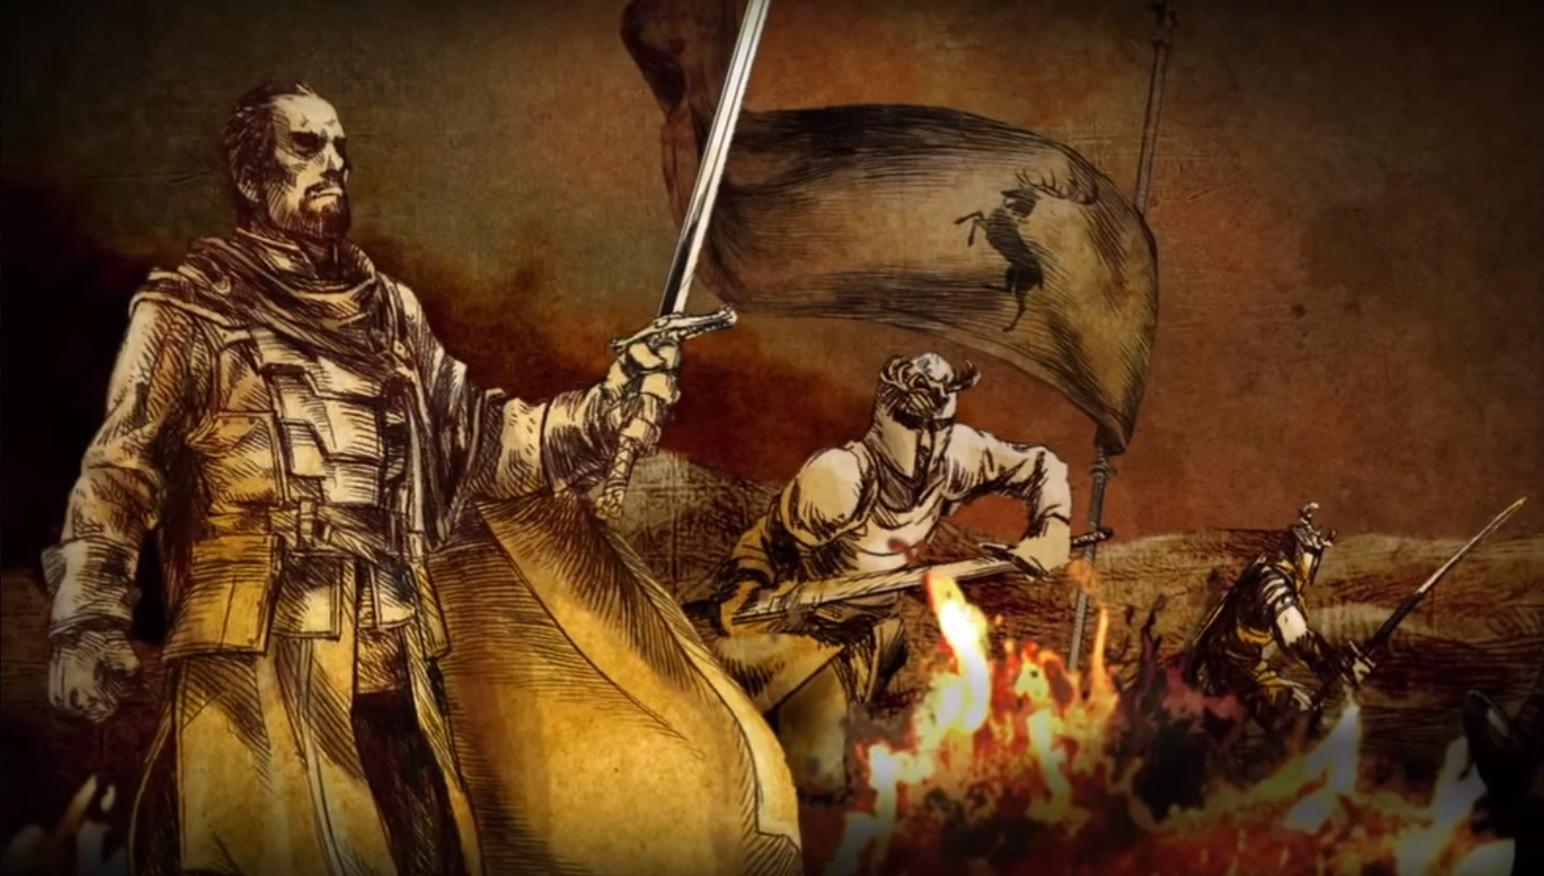 Stannis Baratheon - Greyjoy Rebellion